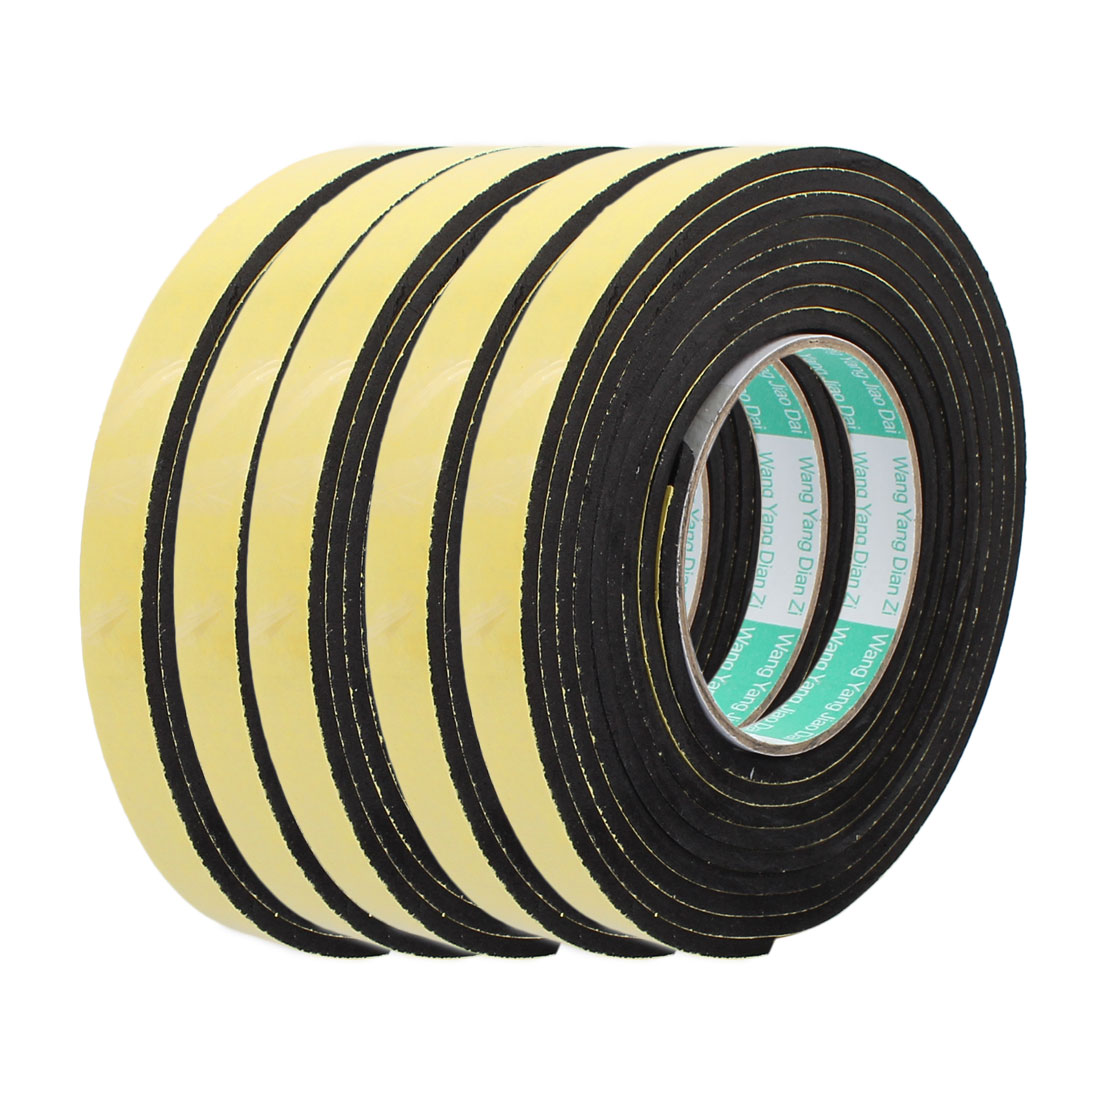 5 Pcs 3 Meter 15mm x 4mm Single-side Adhesive Shockproof Sponge Foam Tape Yellow